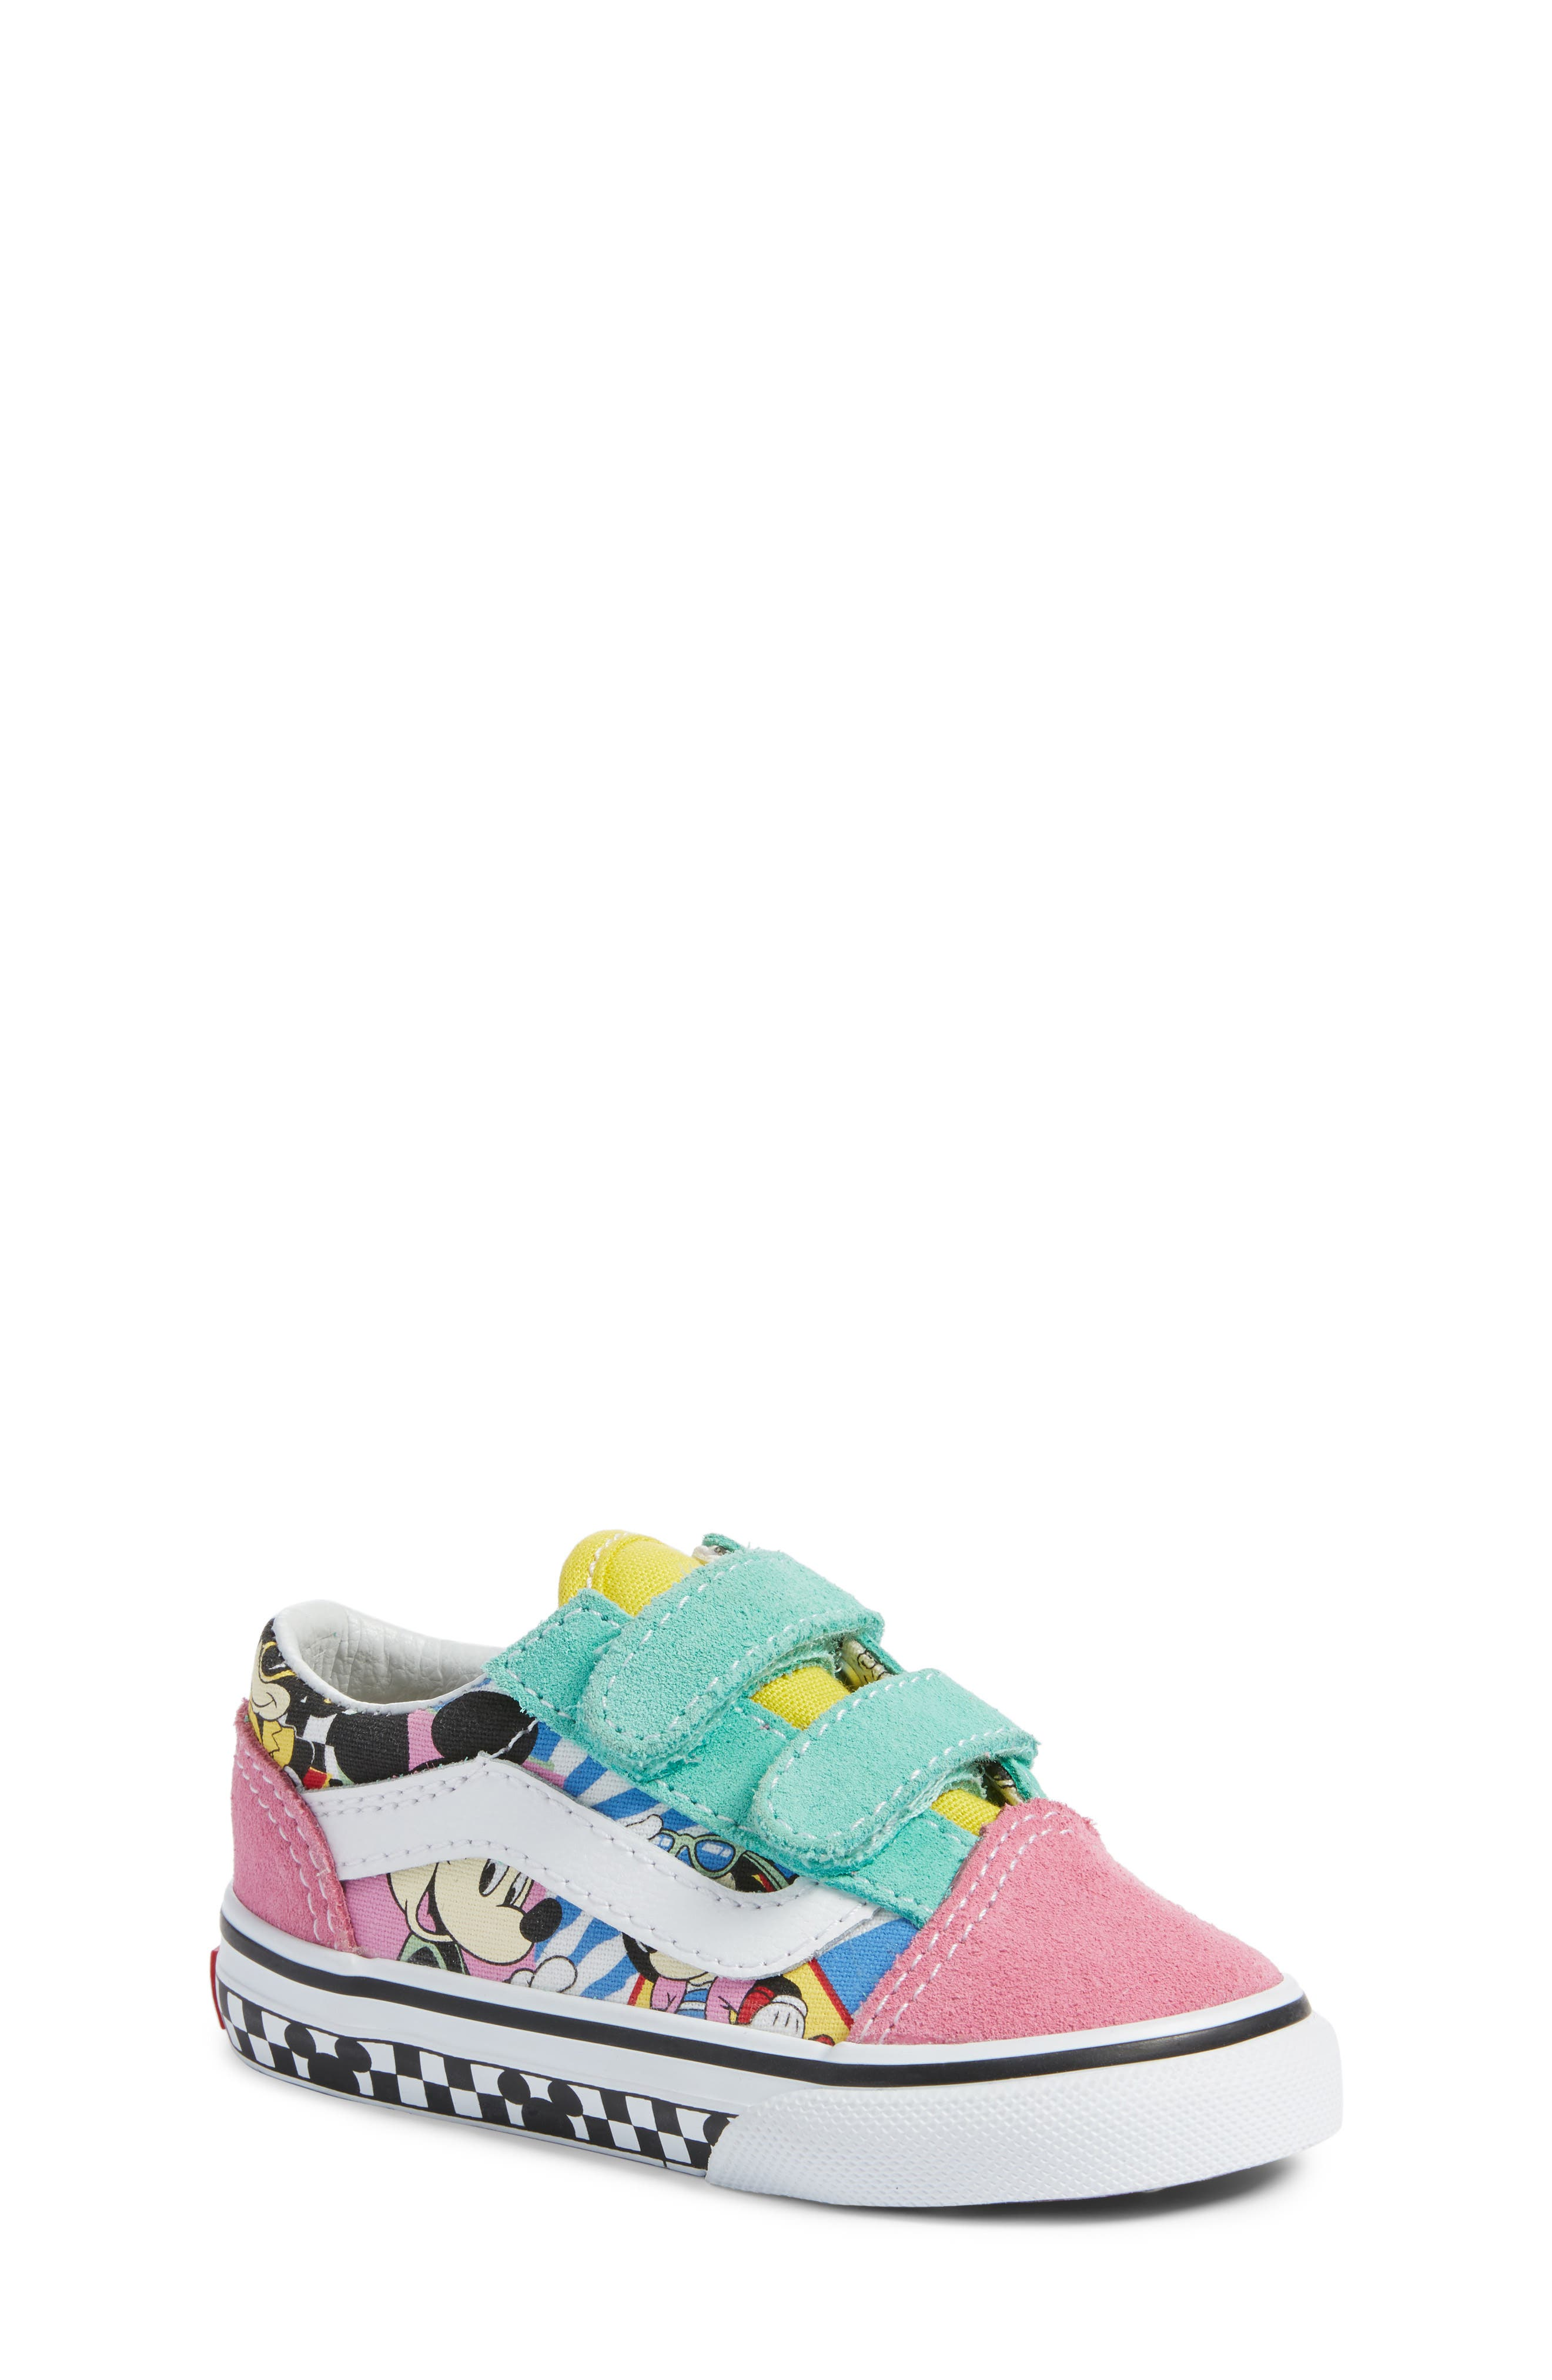 VANS x Disney Old Skool V Sneaker, Main, color, 650